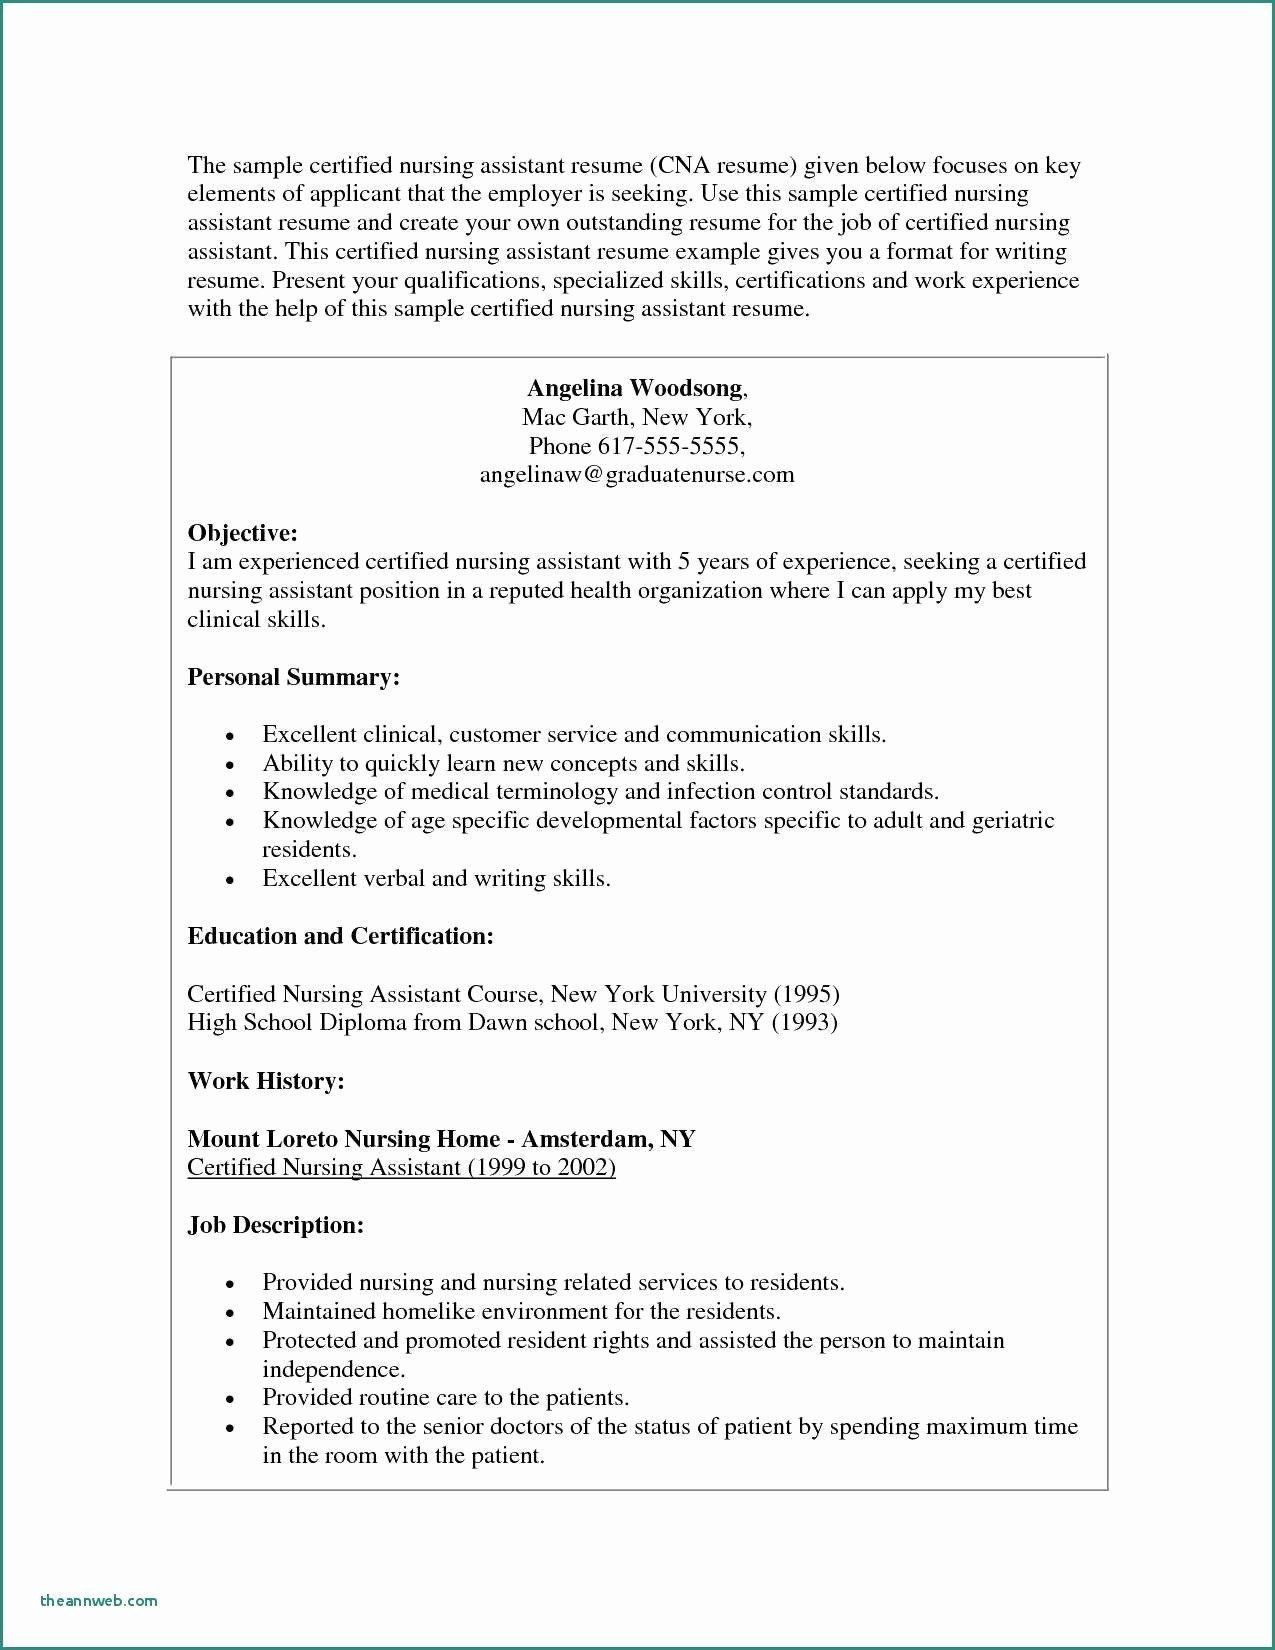 30 5 Years Experience Resume Resume, Resume skills